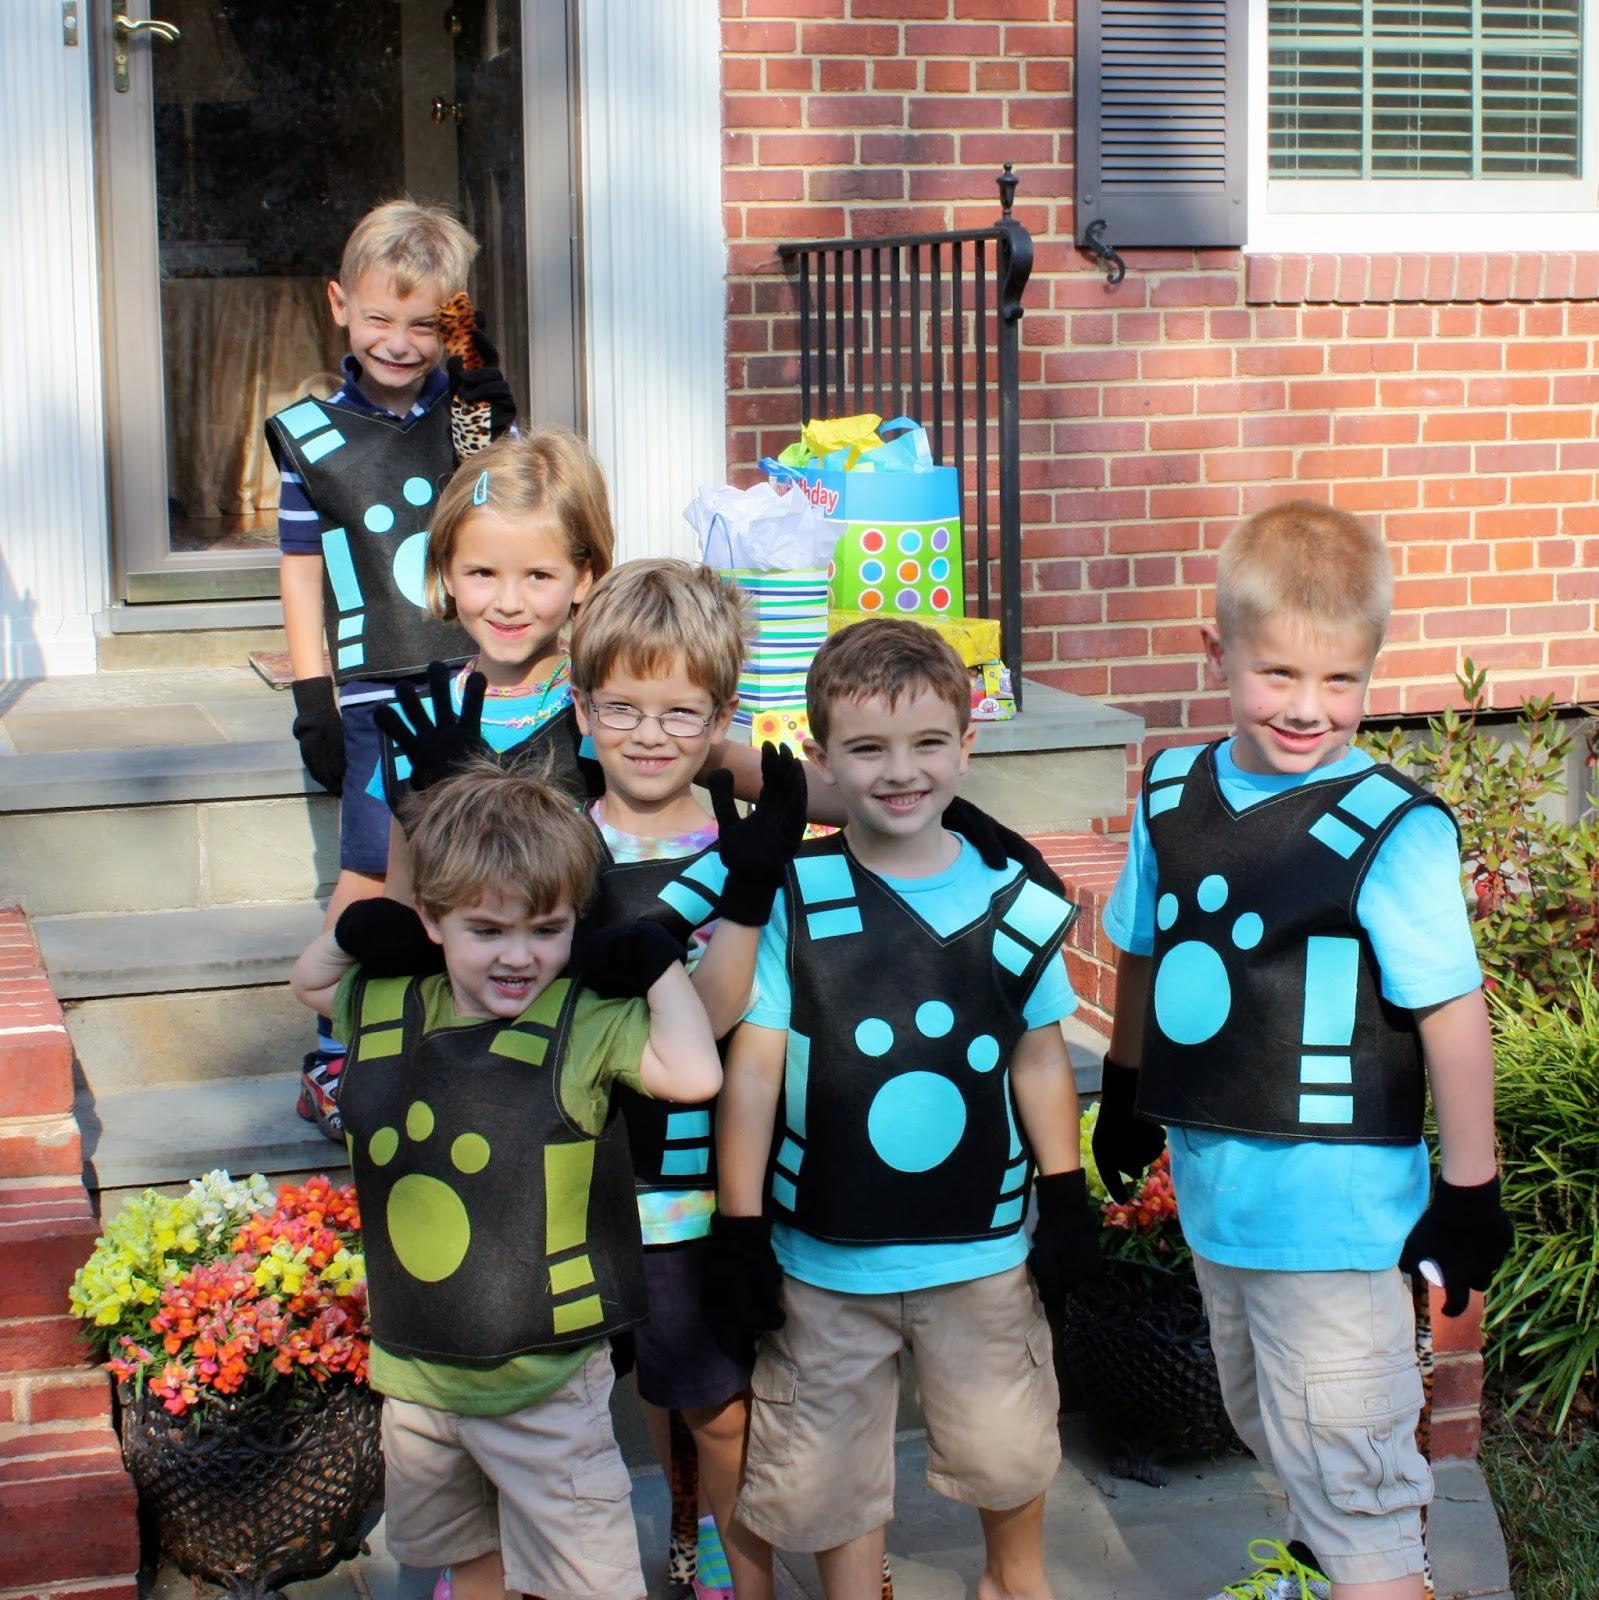 The Kratt Brothers Family